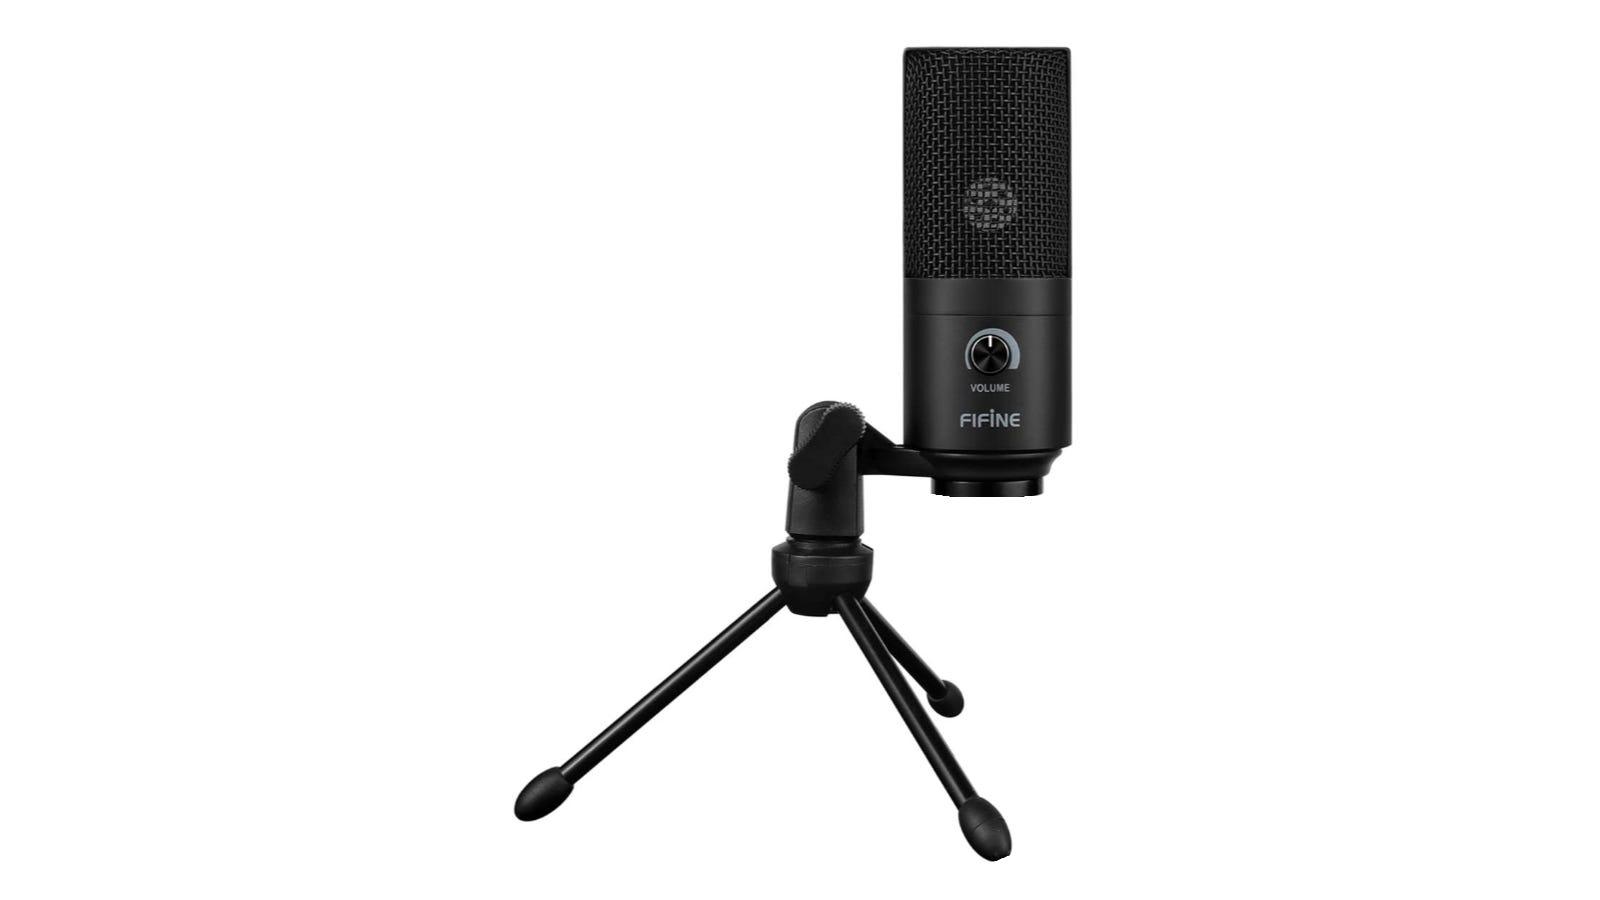 Fifine K669B microphone